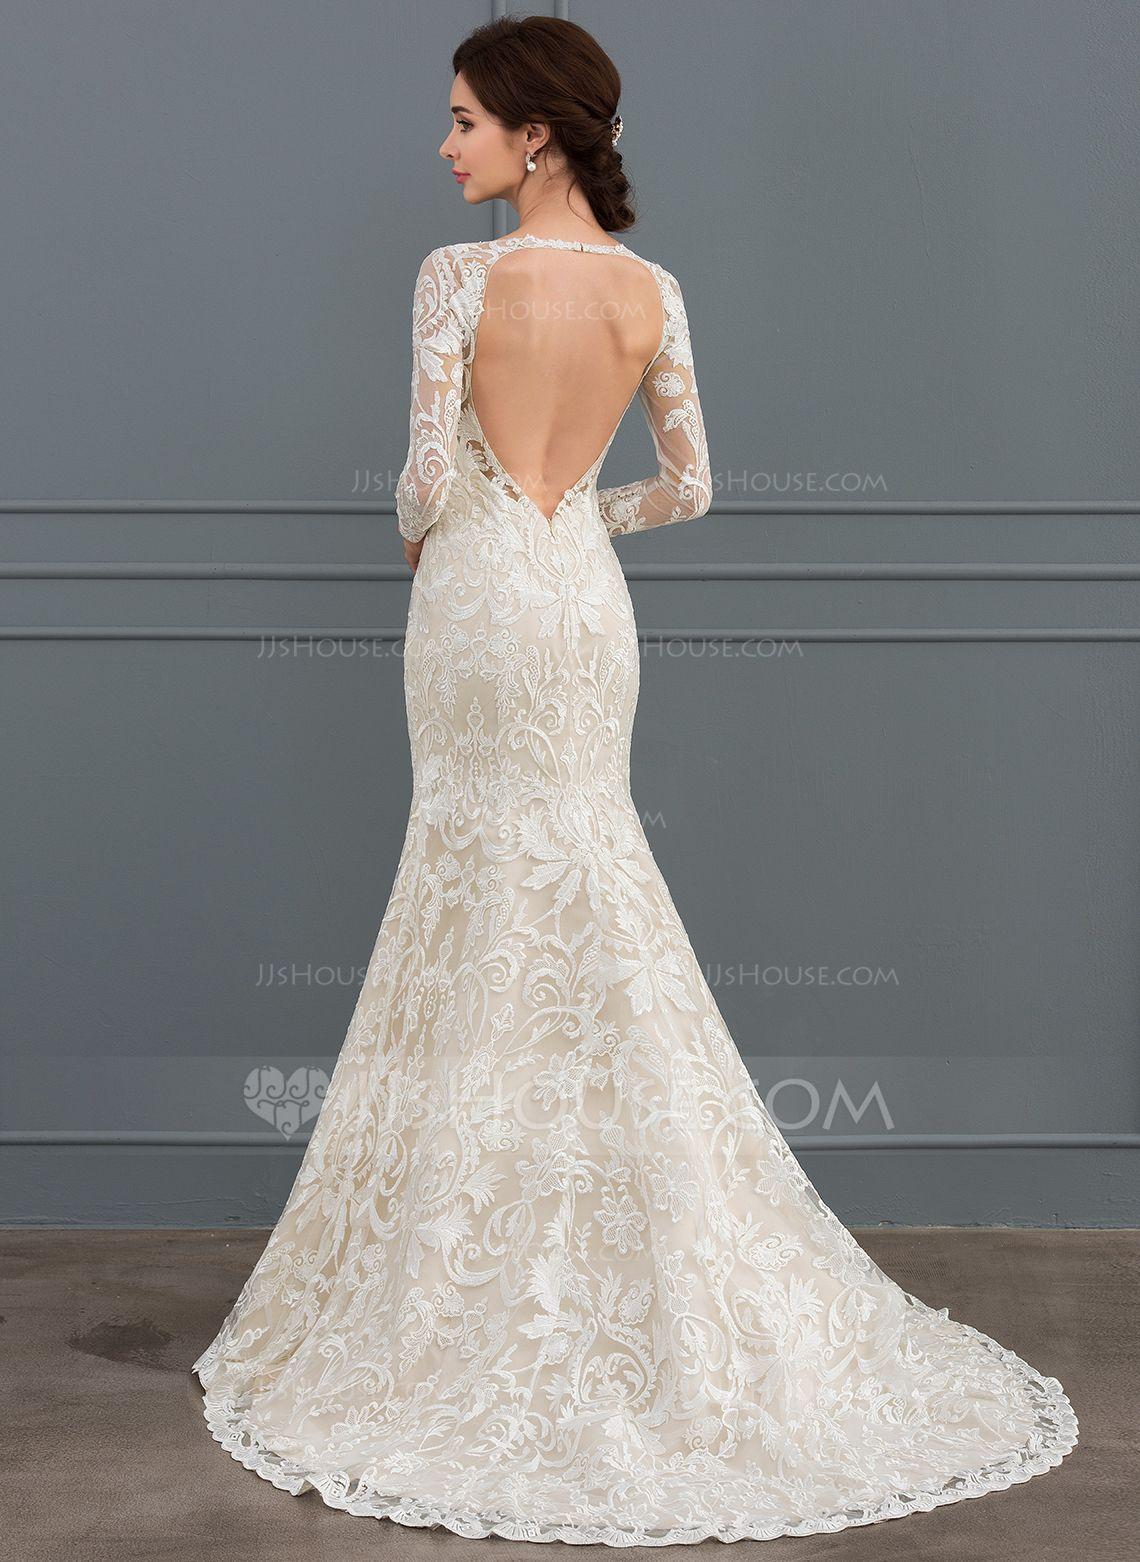 Us 322 00 Trumpet Mermaid V Neck Sweep Train Lace Wedding Dress Jj S House Wedding Dresses Affordable Wedding Dresses Wedding Dresses Romantic [ 1562 x 1140 Pixel ]